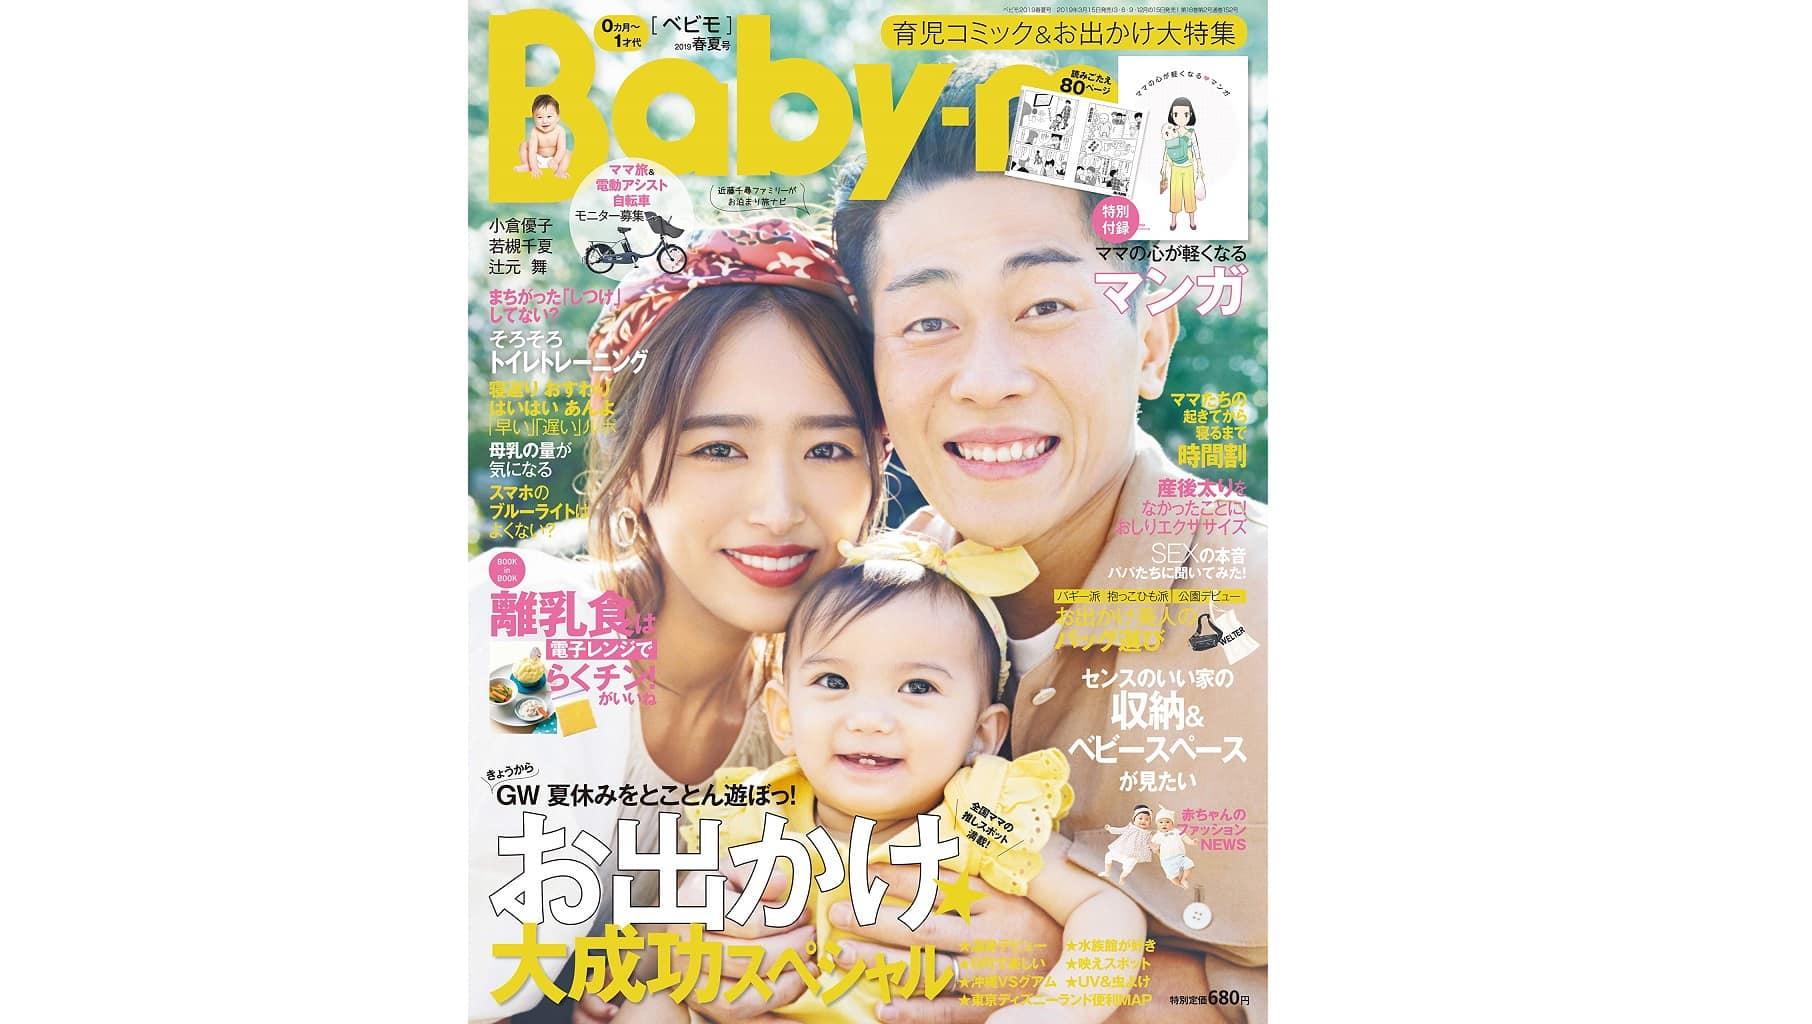 Amaia Kids ♥雑誌Baby-mo(べビモ)2019年春夏号にアマイアキッズの商品が掲載されました